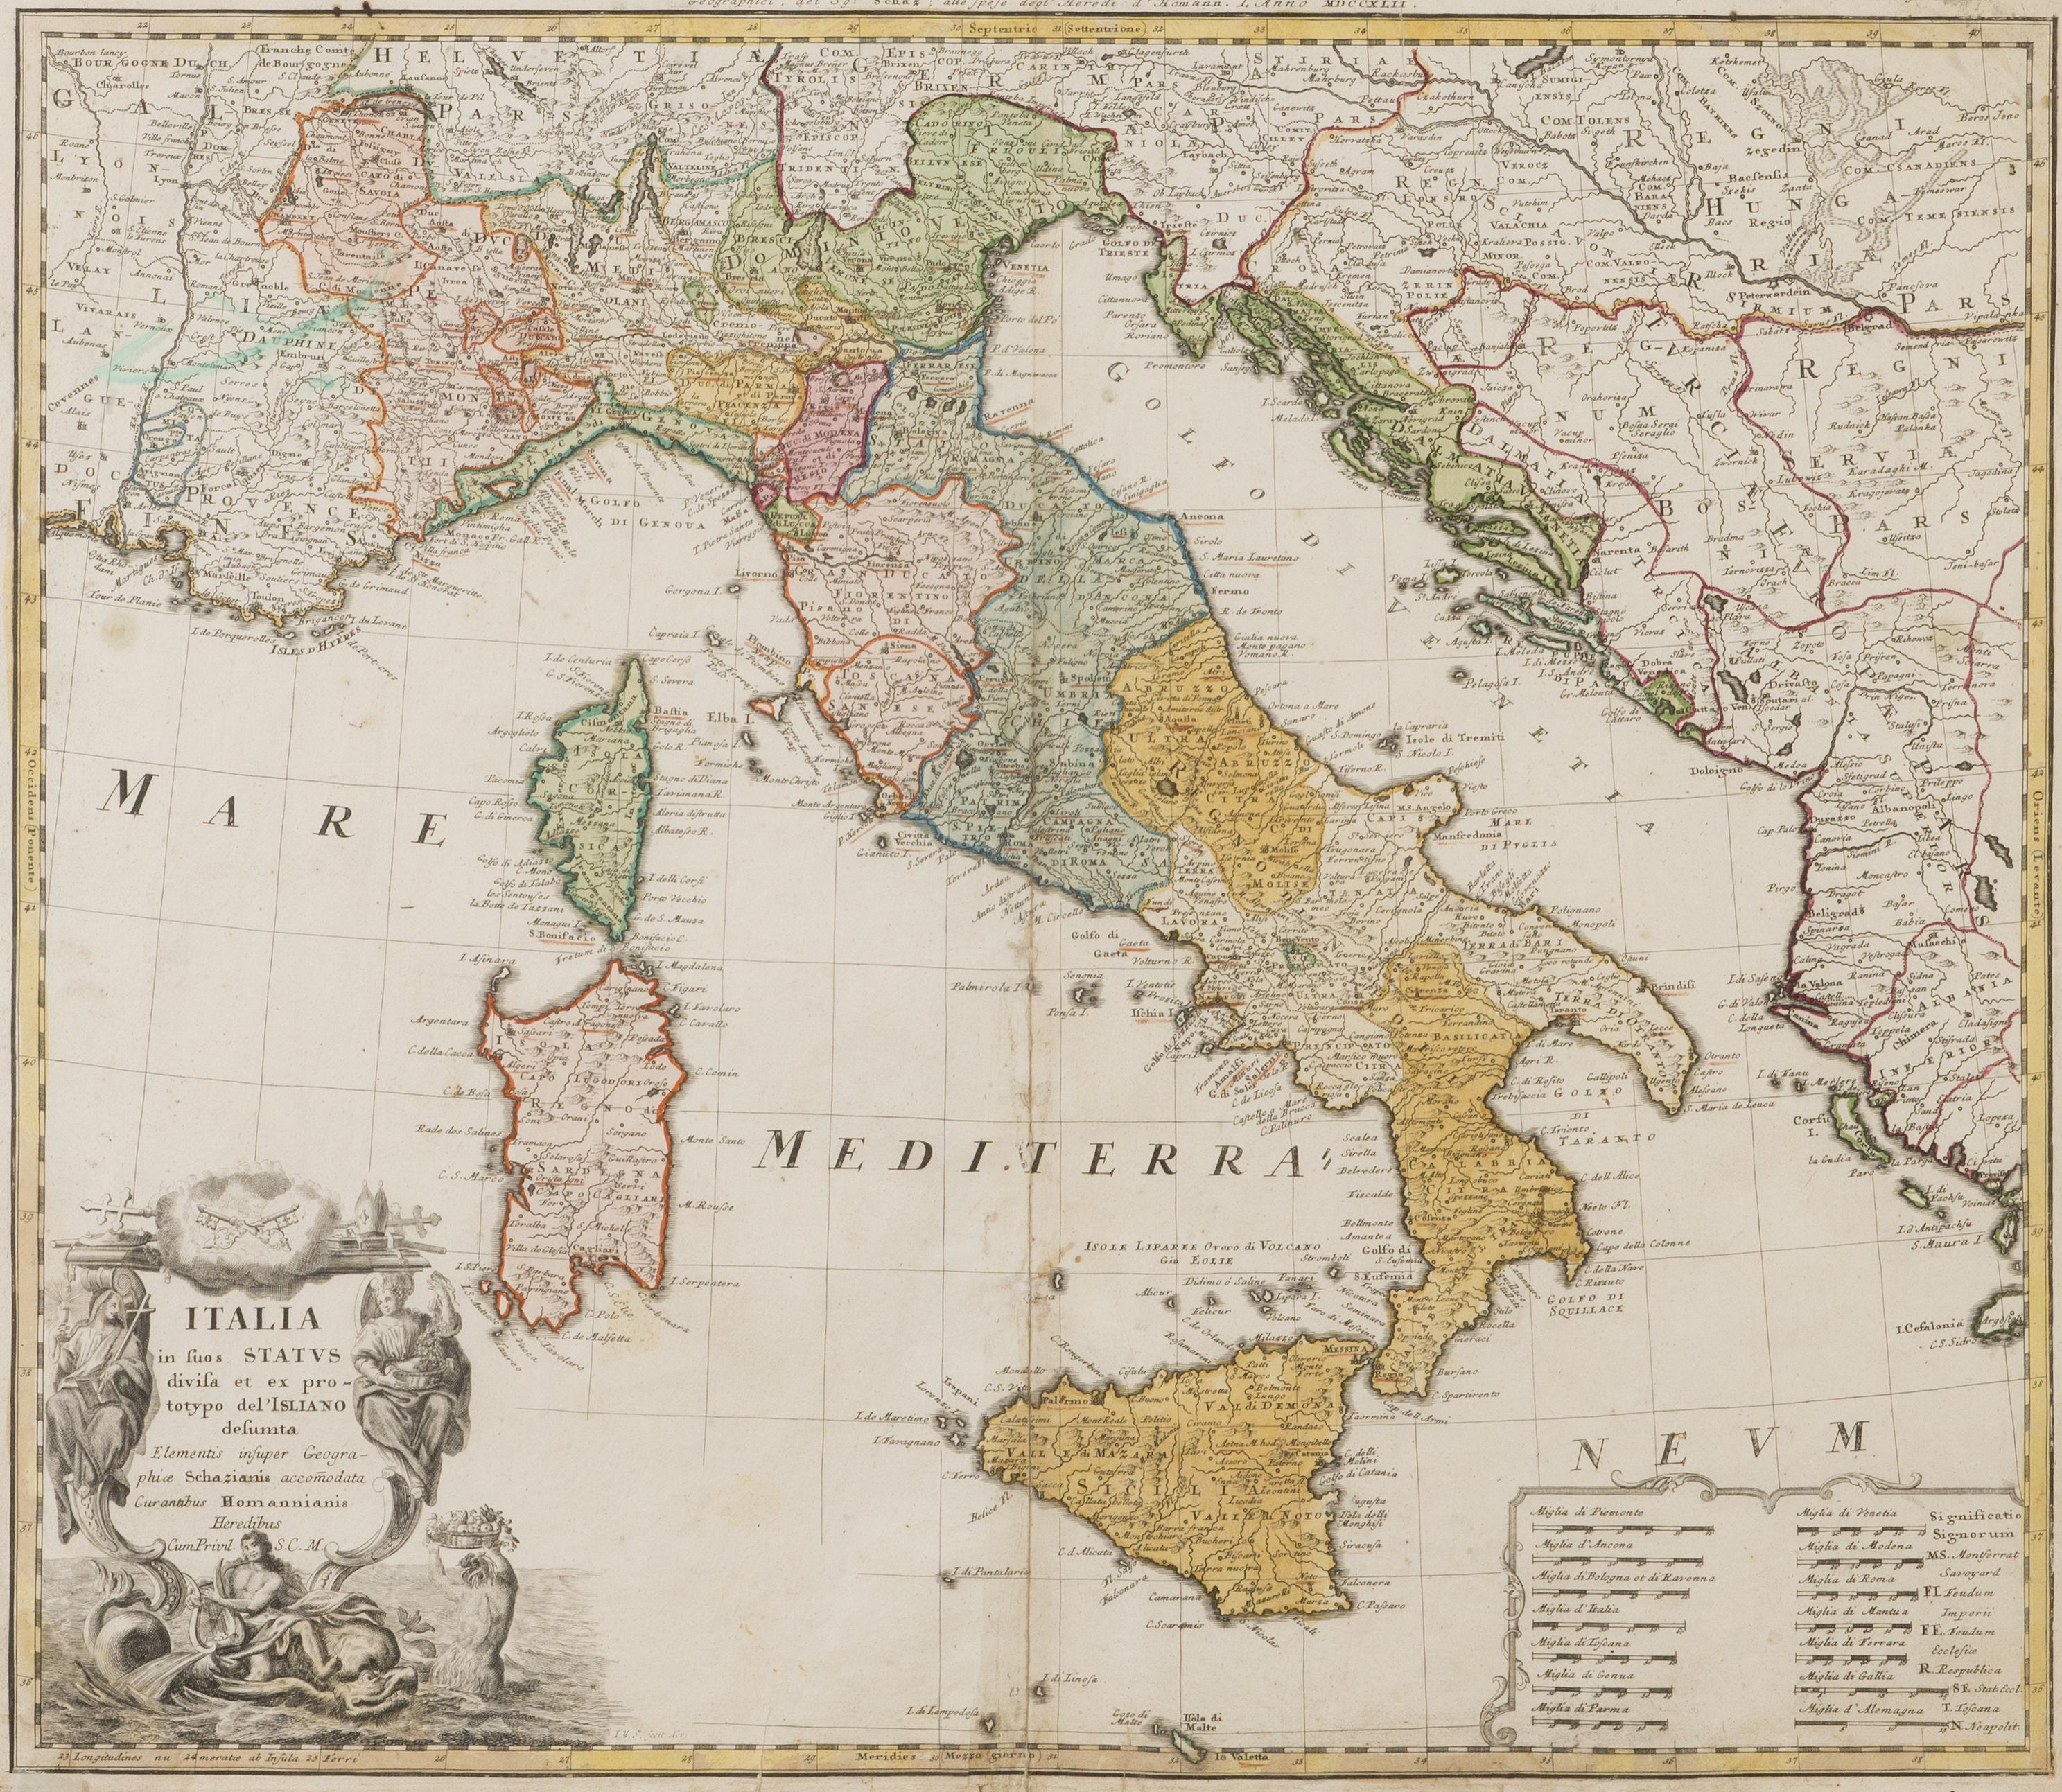 Kartta Italia In Suos Status Divisa Homanns Efterfoljare